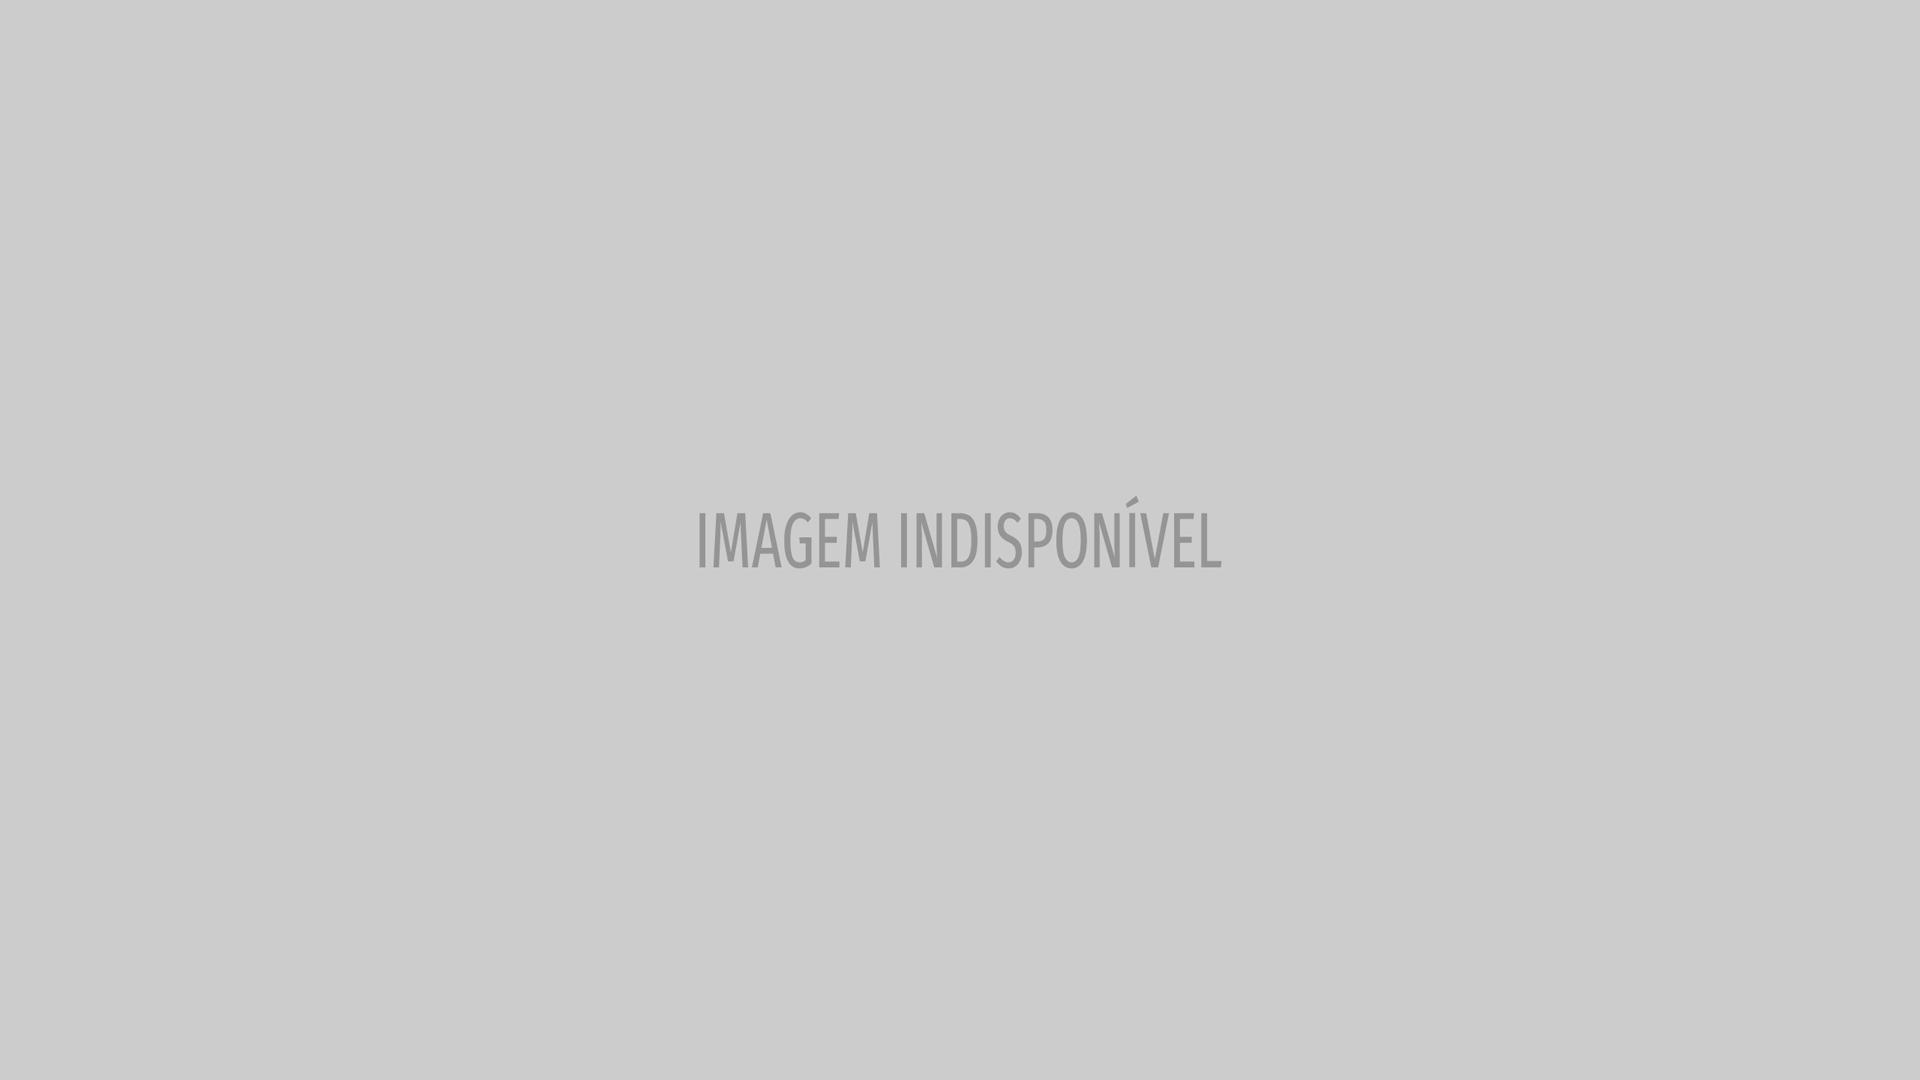 Eis as fotos do casamento de Tucha da 'Casa dos Segredos'